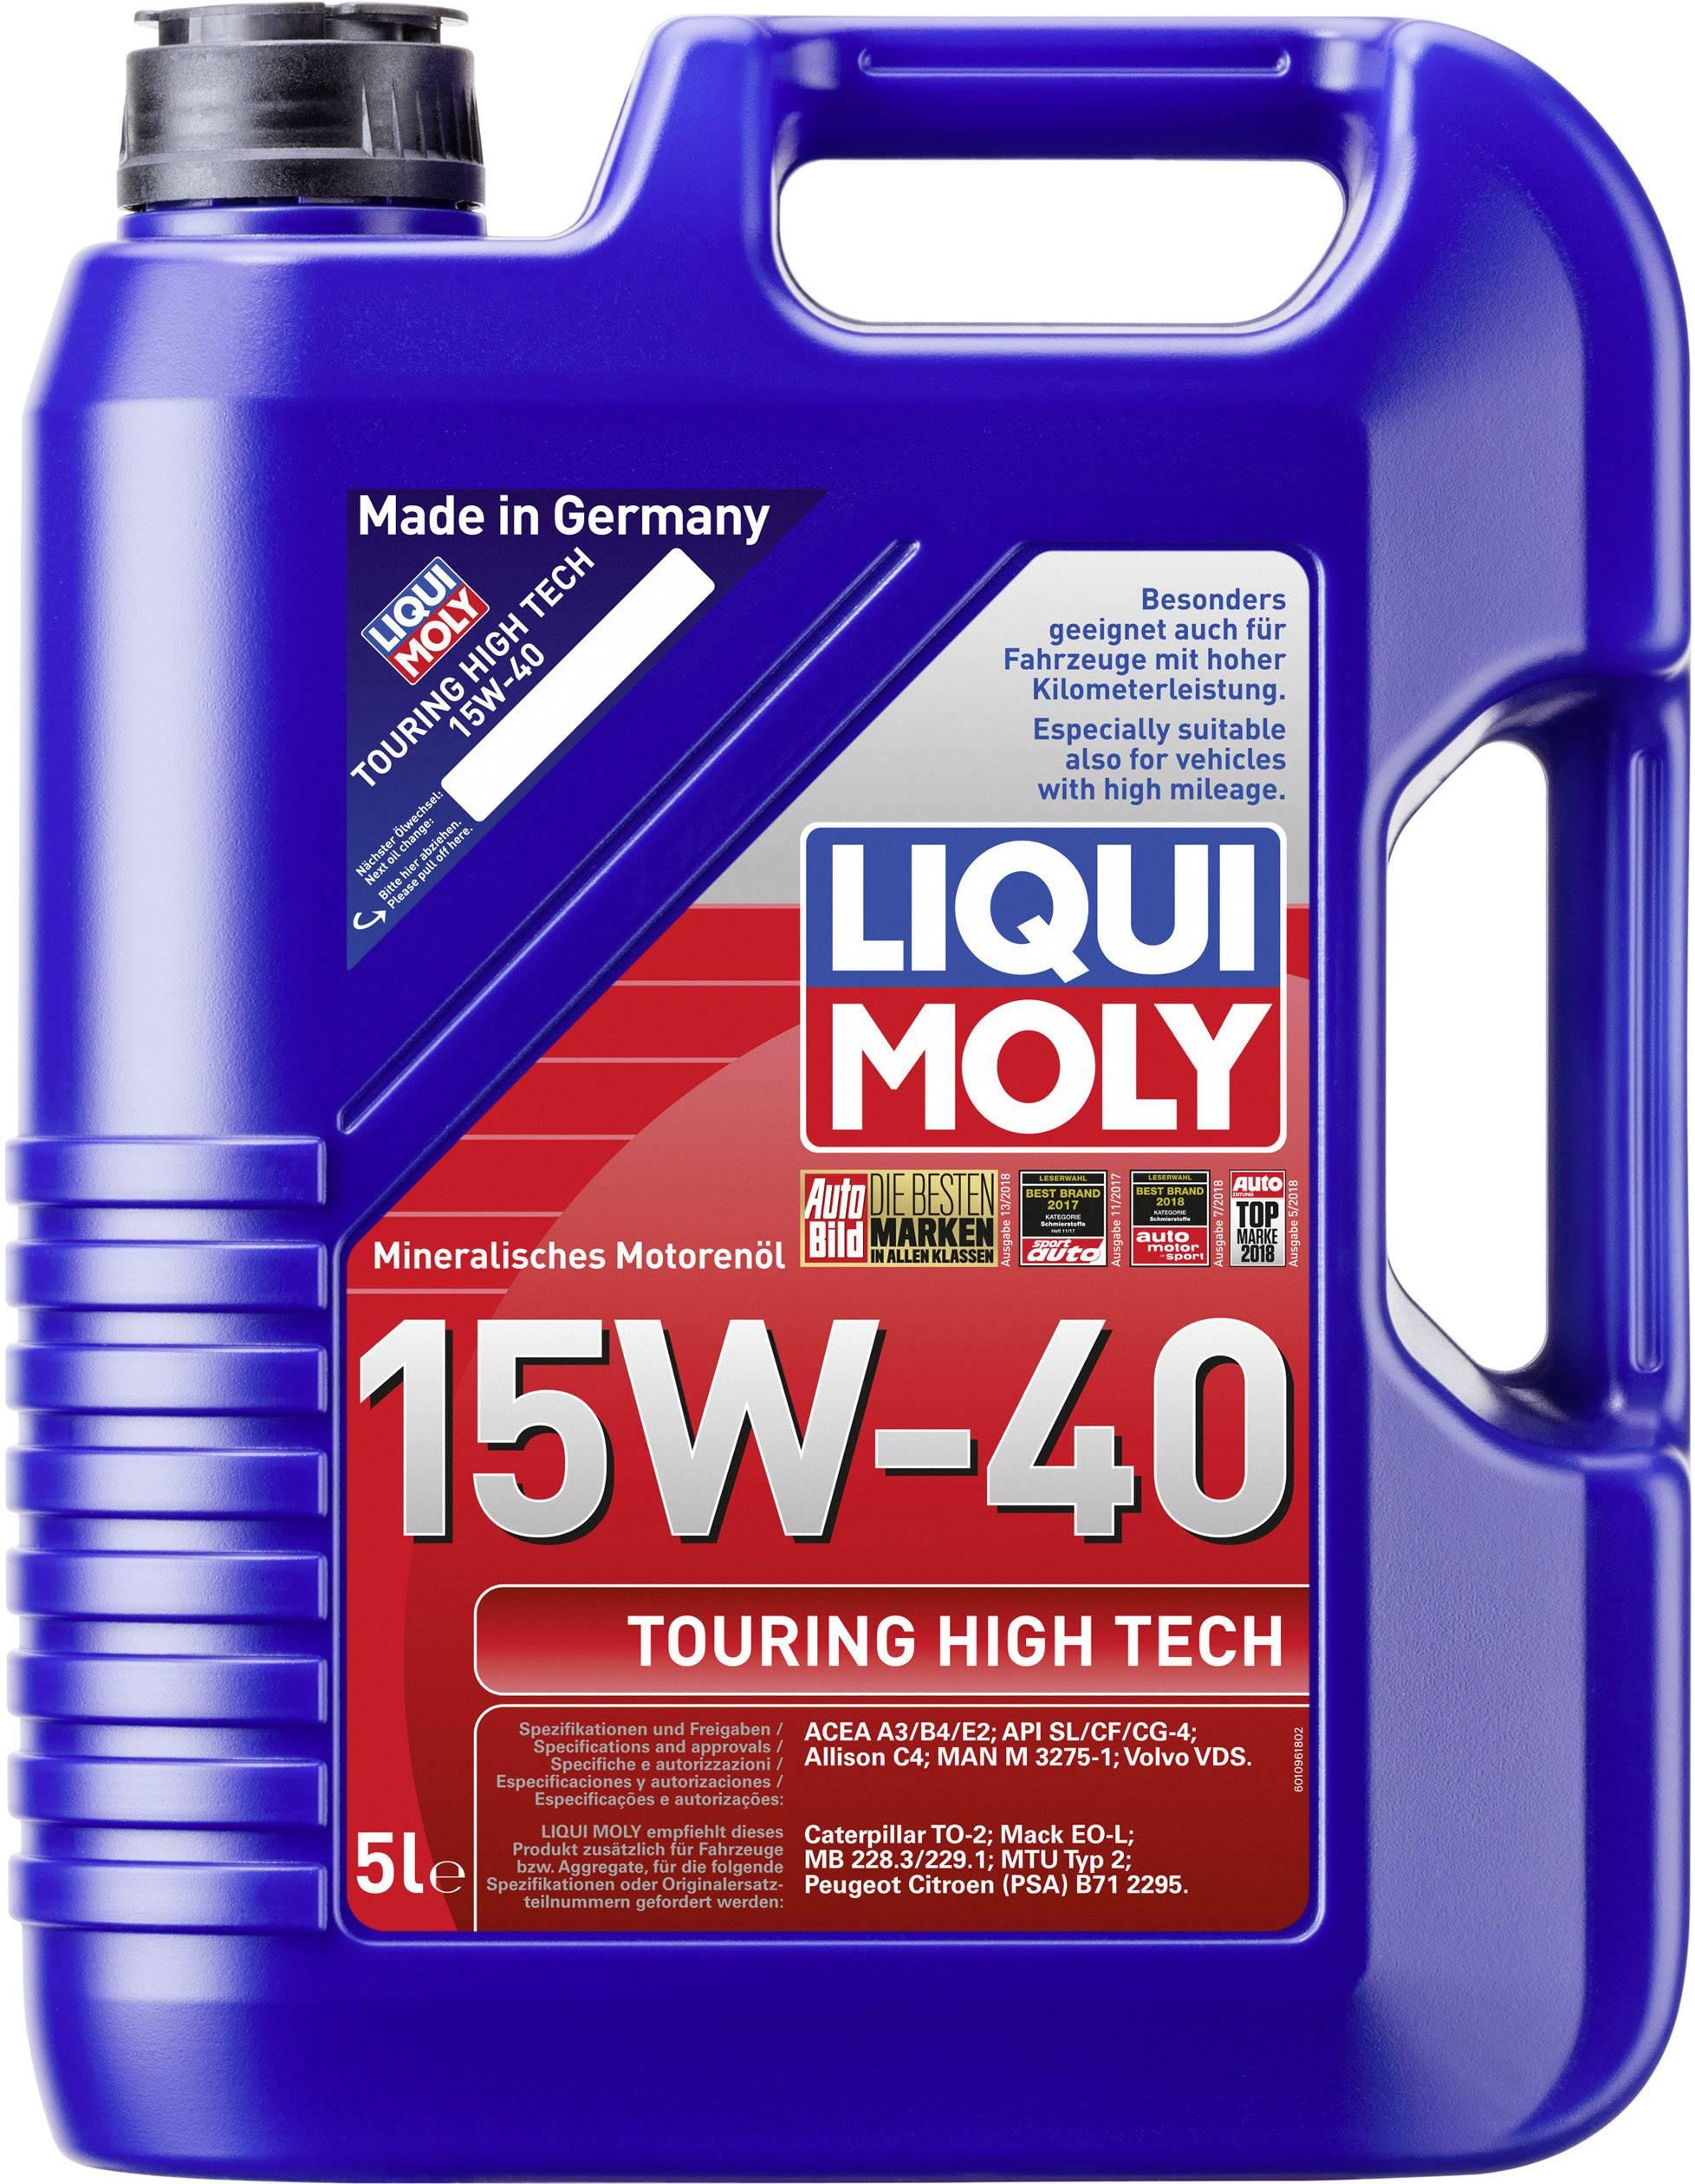 Liqui Moly Touring High Tech 15W-40 1096 Engine oil 5 l